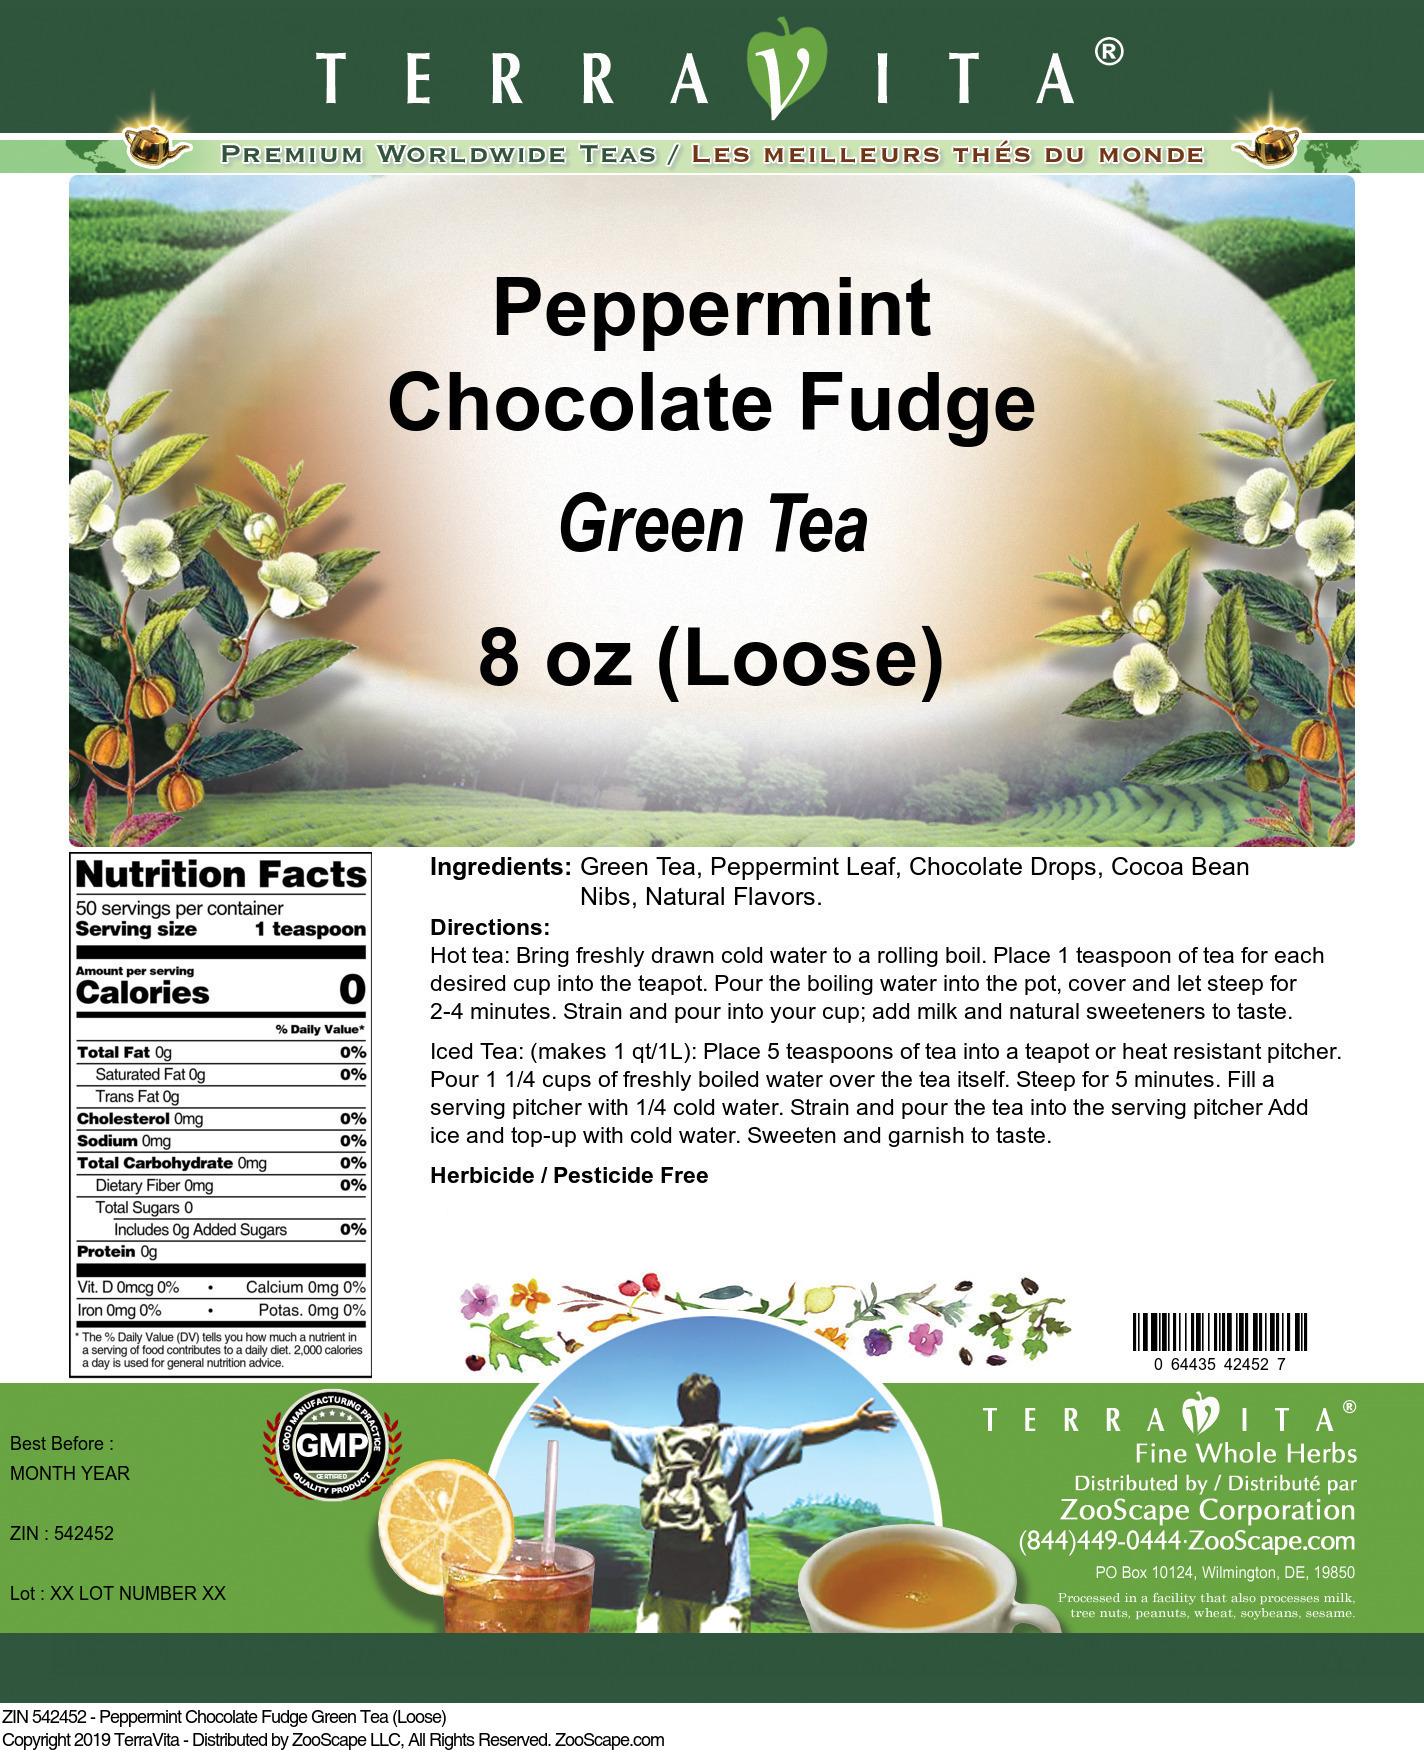 Peppermint Chocolate Fudge Green Tea (Loose)